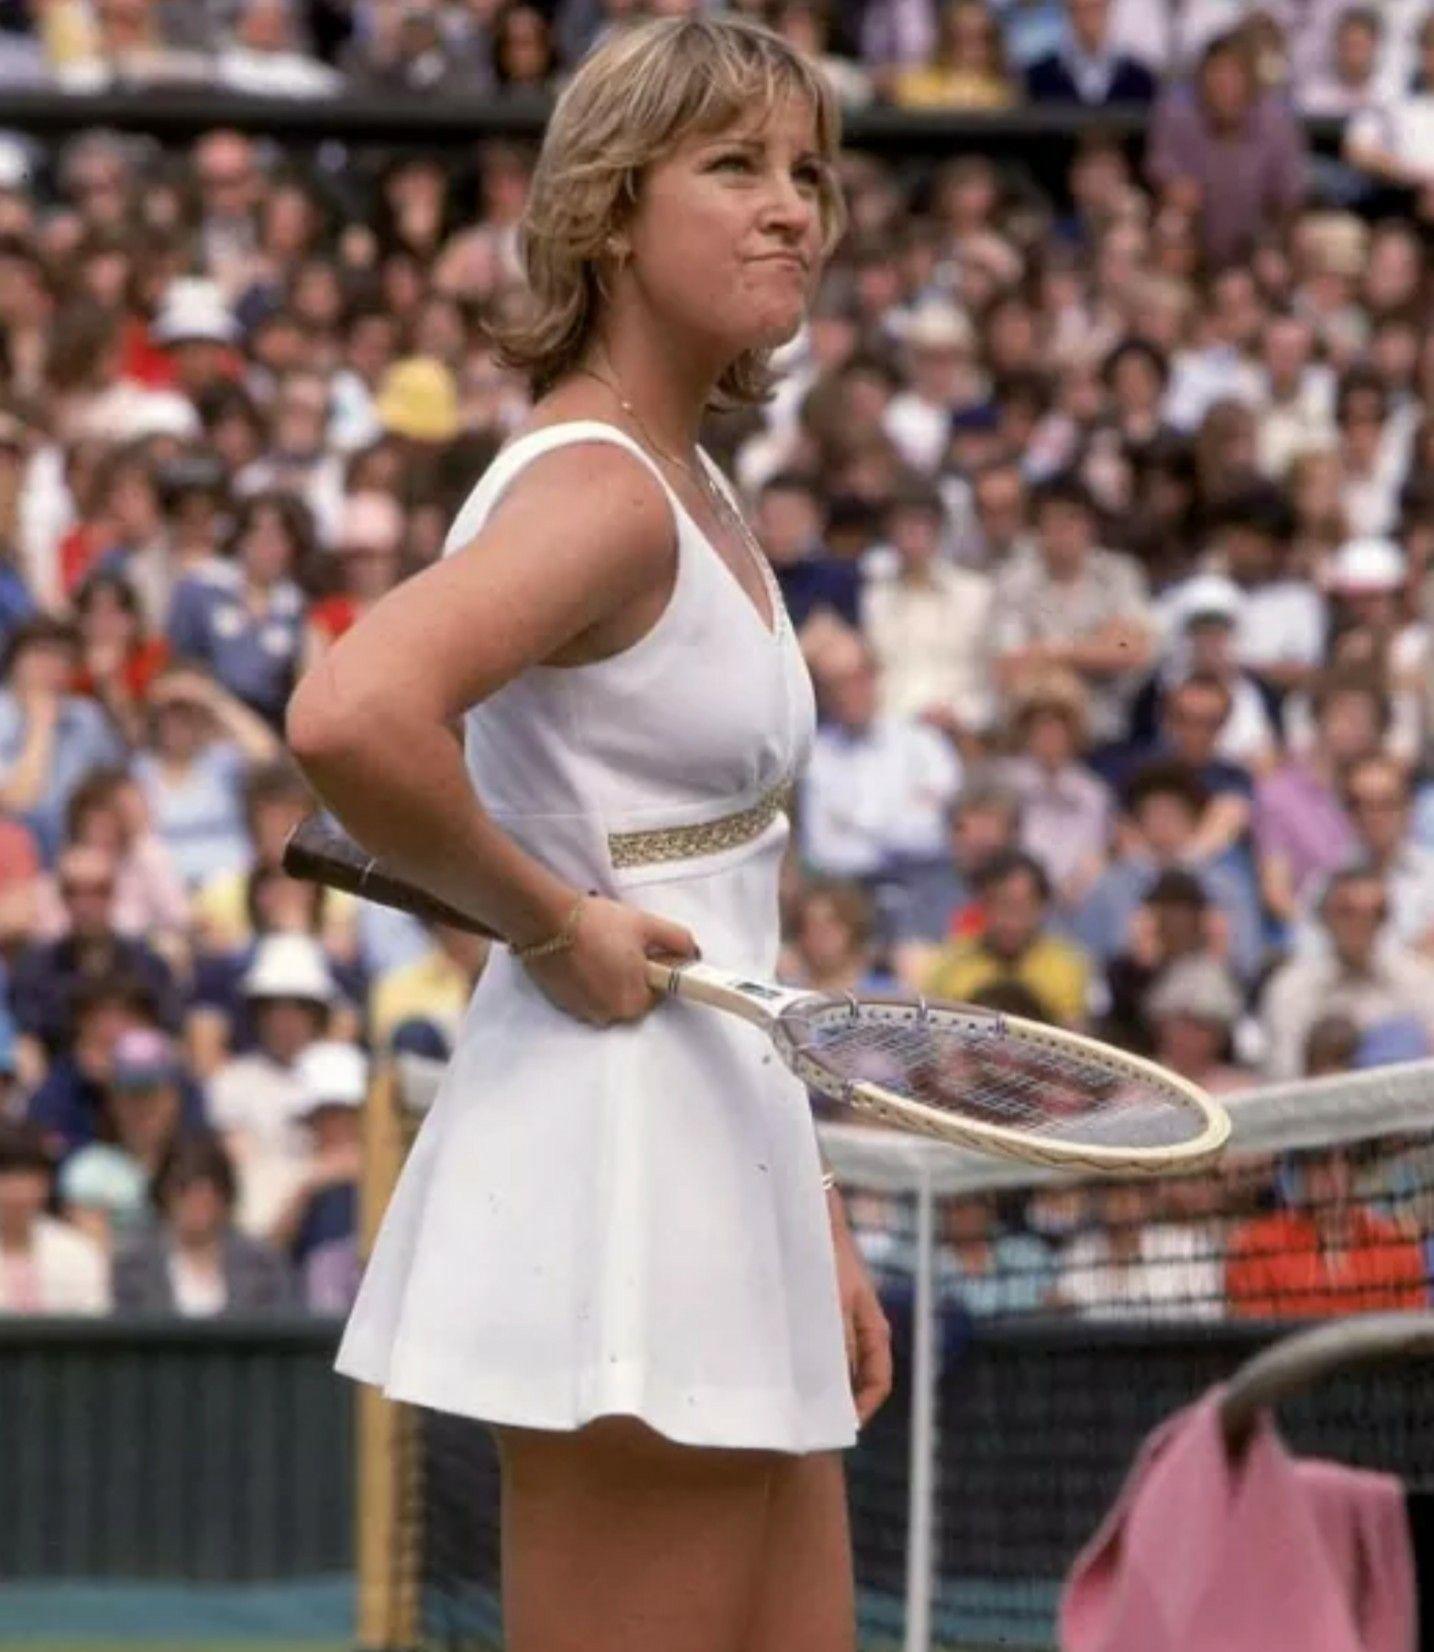 Chris Everett-Lloyd | Tennis players female, Chris evert